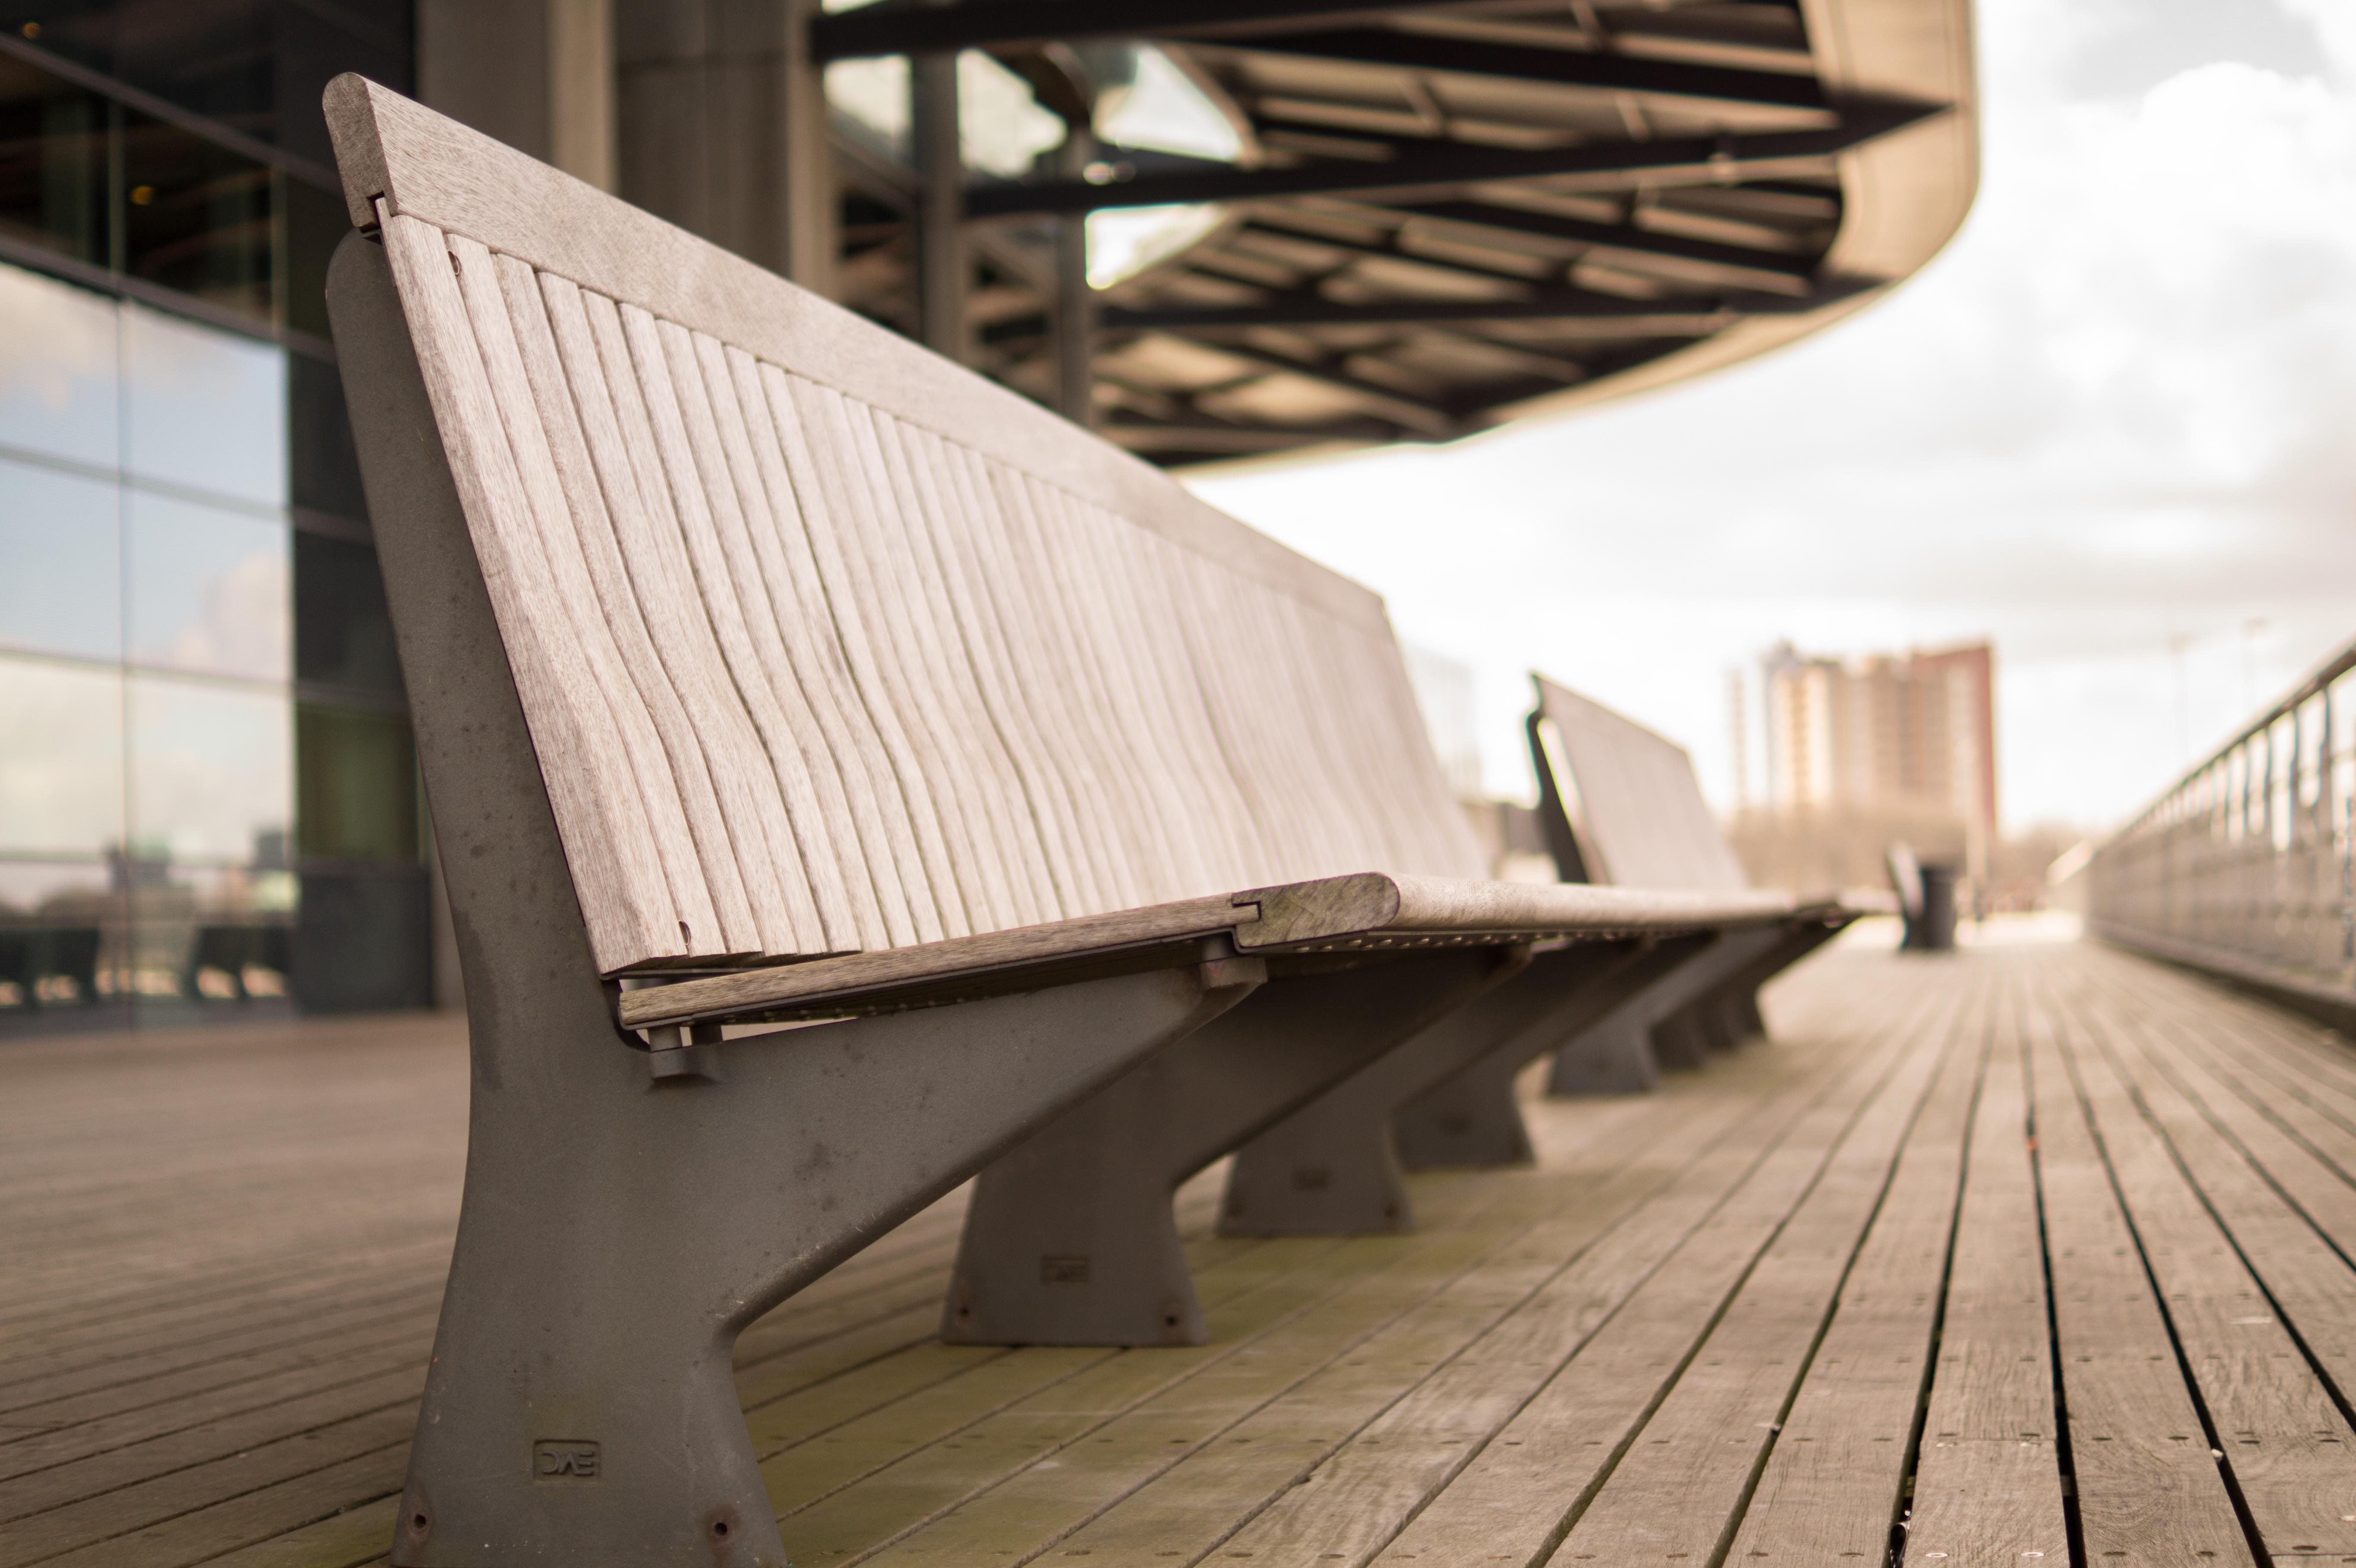 Fotos gratis : arquitectura, madera, blanco, banco, ver, perspectiva ...